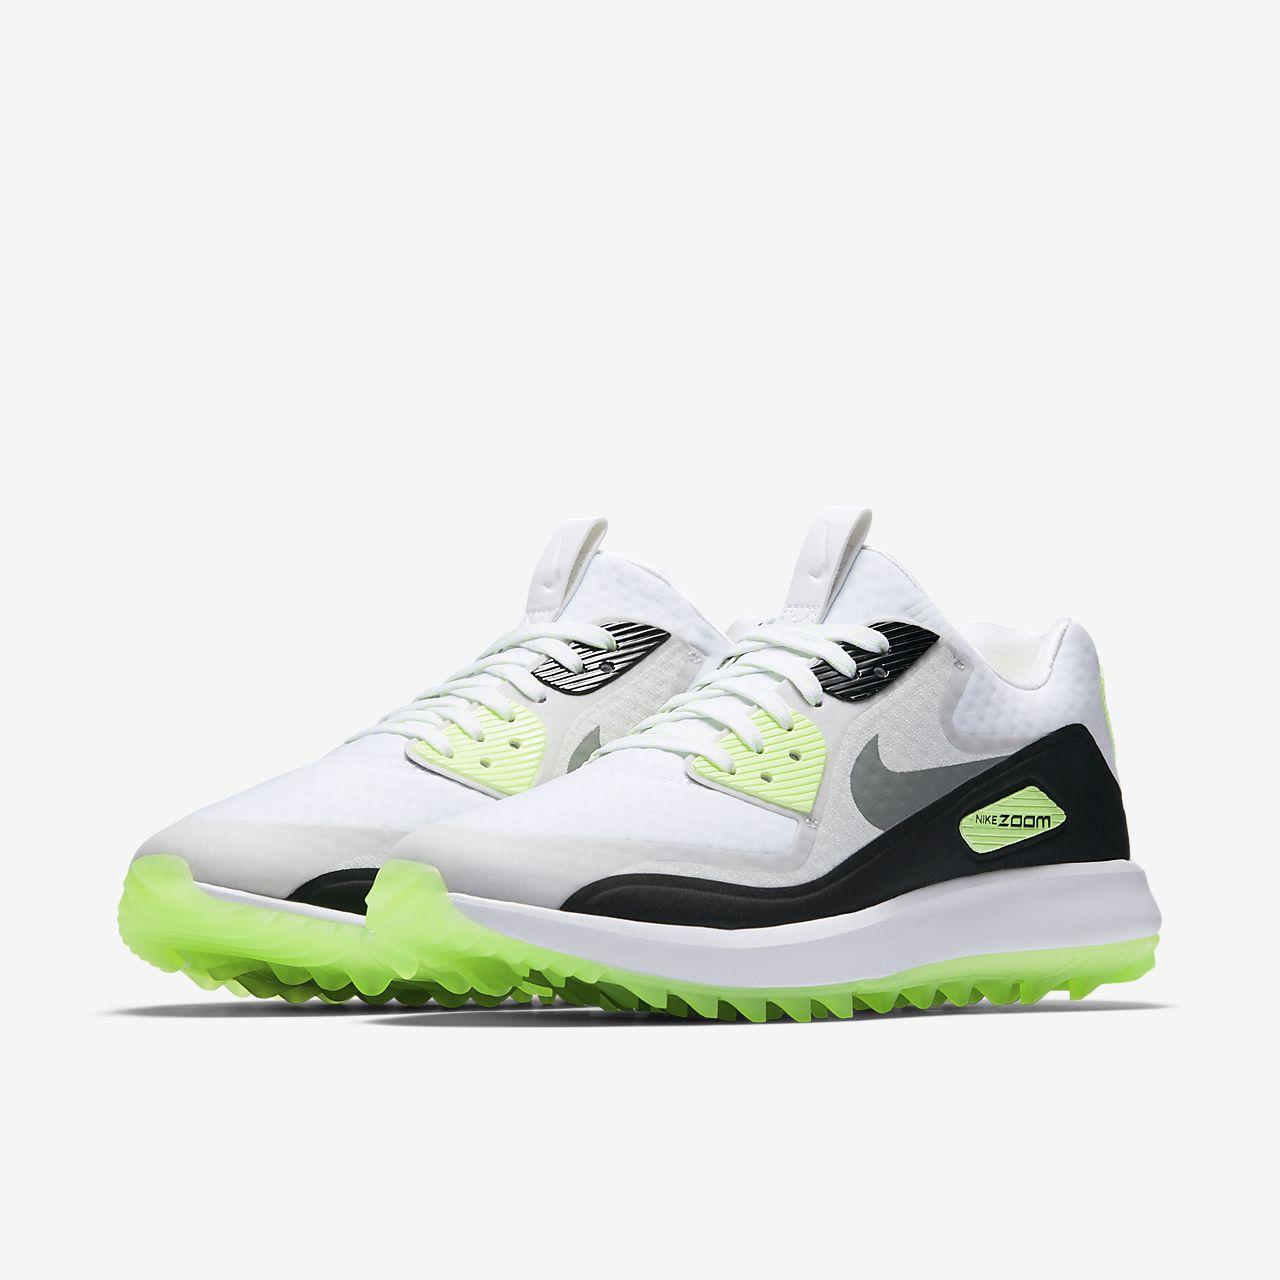 ... Nike Air Zoom 90 IT Women's Golf Shoe